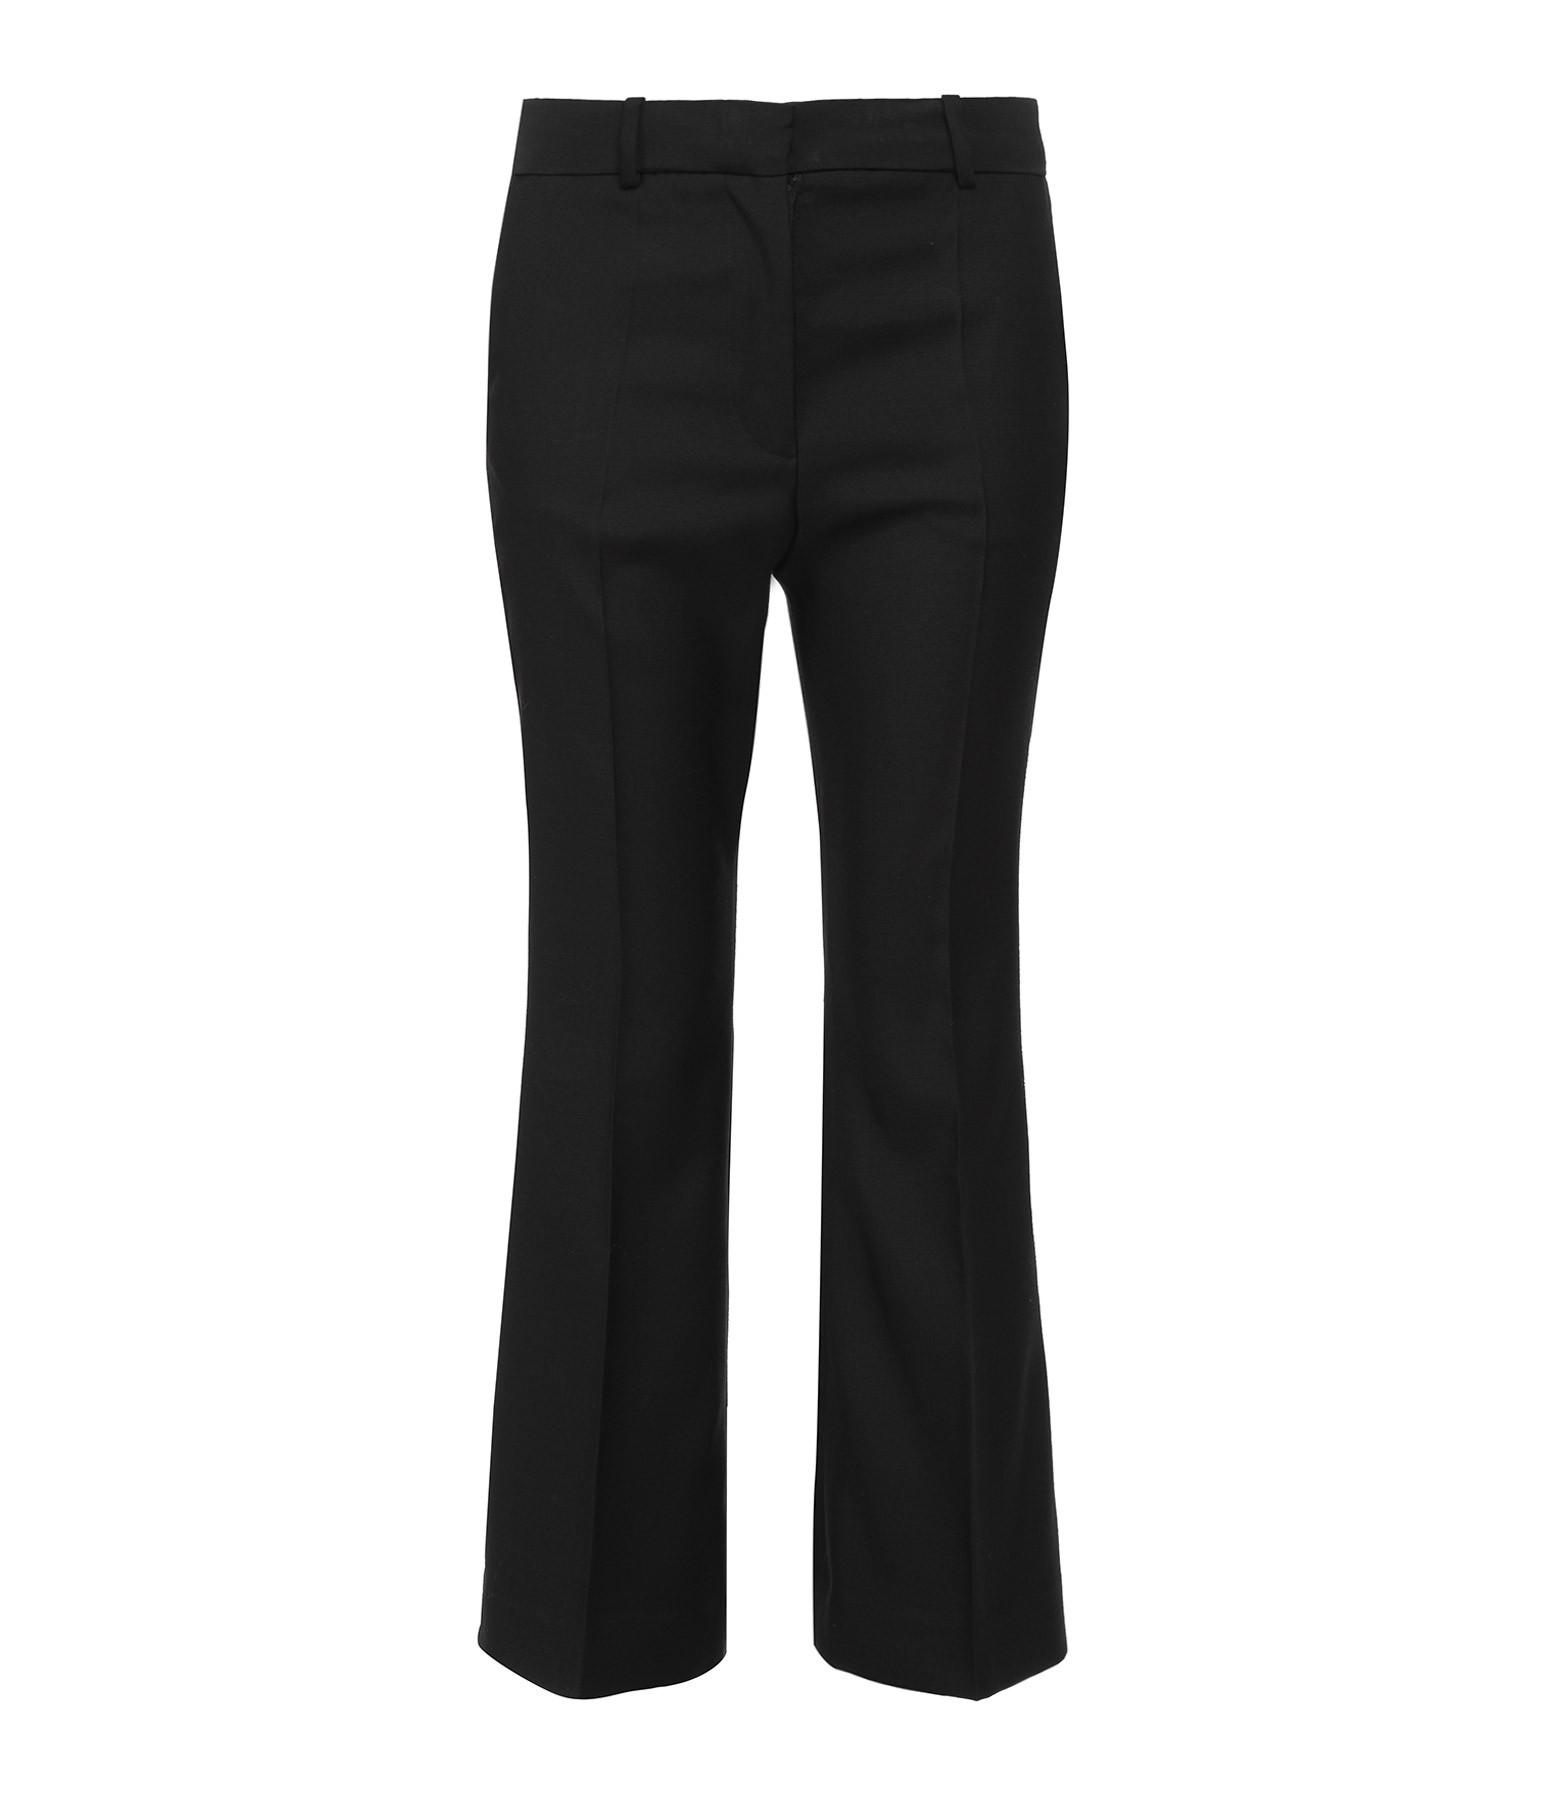 JOSEPH - Pantalon Teller Soie Laine Noir